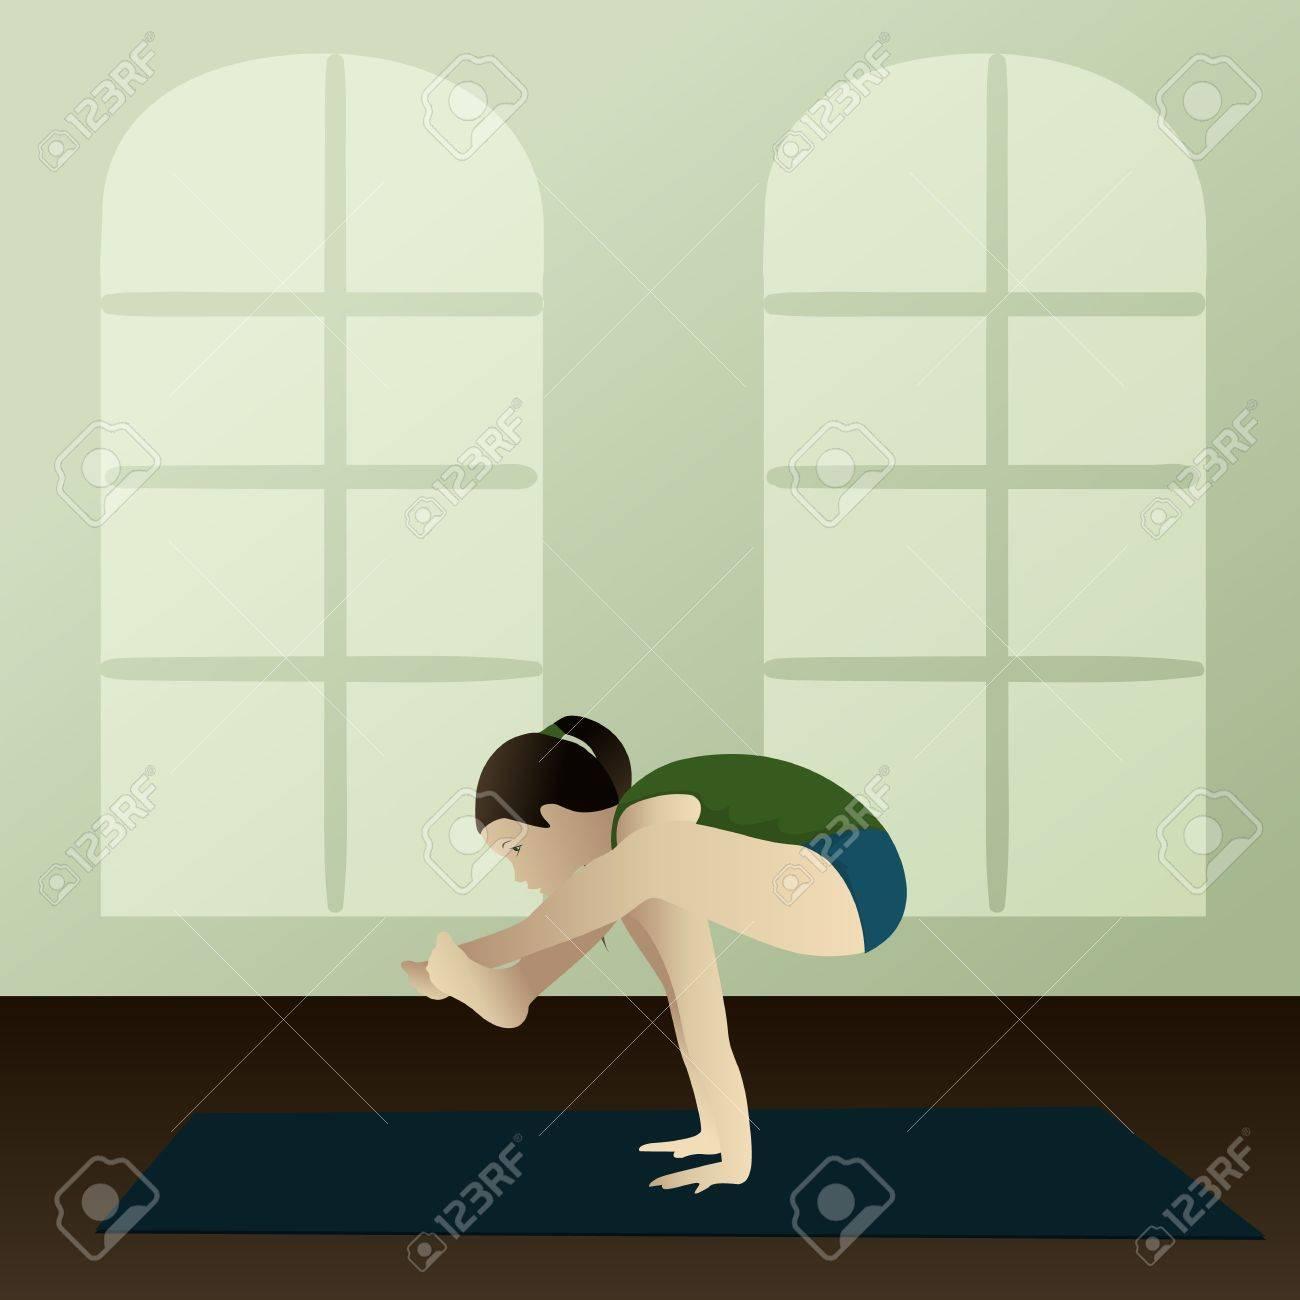 Young woman practicing yoga Bhujapidasana Shoulder Pressing Yoga Pose Stock Vector - 13373593